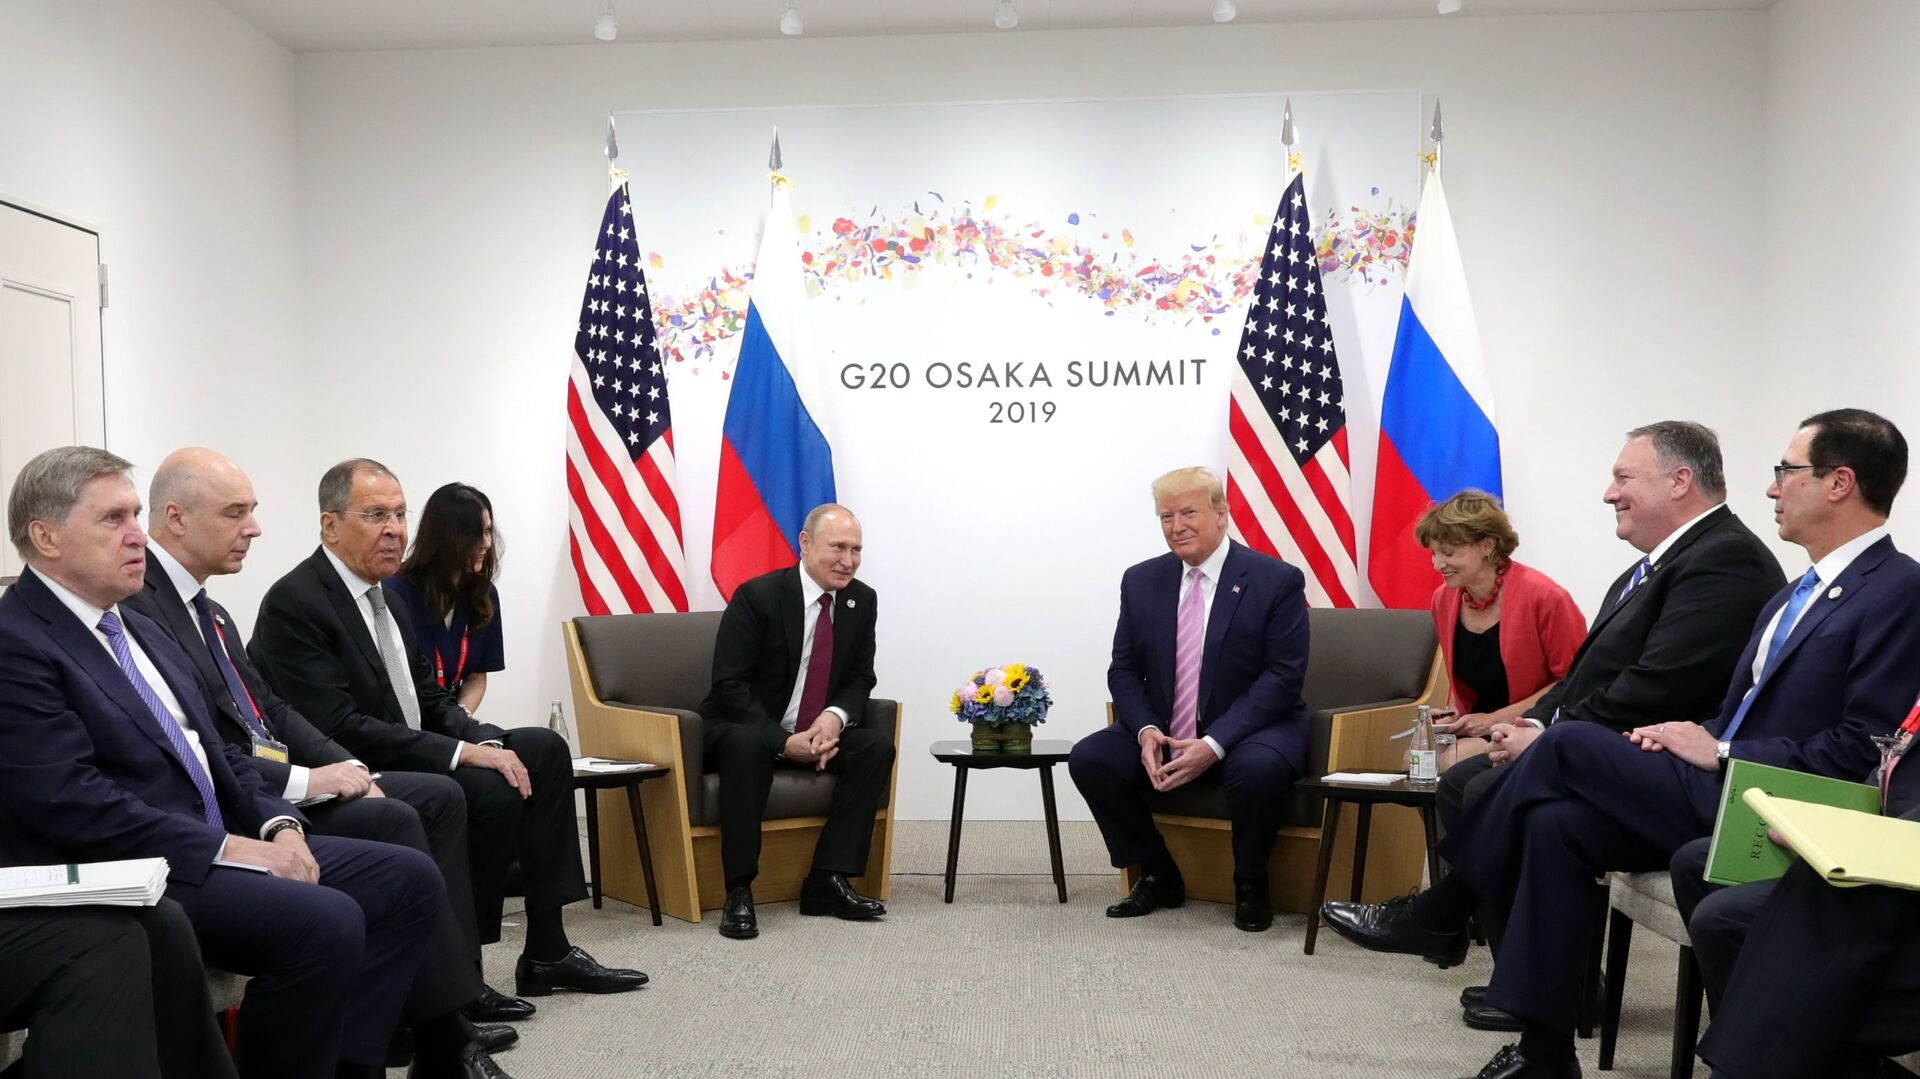 Delegations, led by Russia's President Vladimir Putin and U.S. President Donald Trump, hold talks on the sidelines of the G20 summit in Osaka, Japan June 28, 2019 - Sputnik International, 1920, 28.09.2021